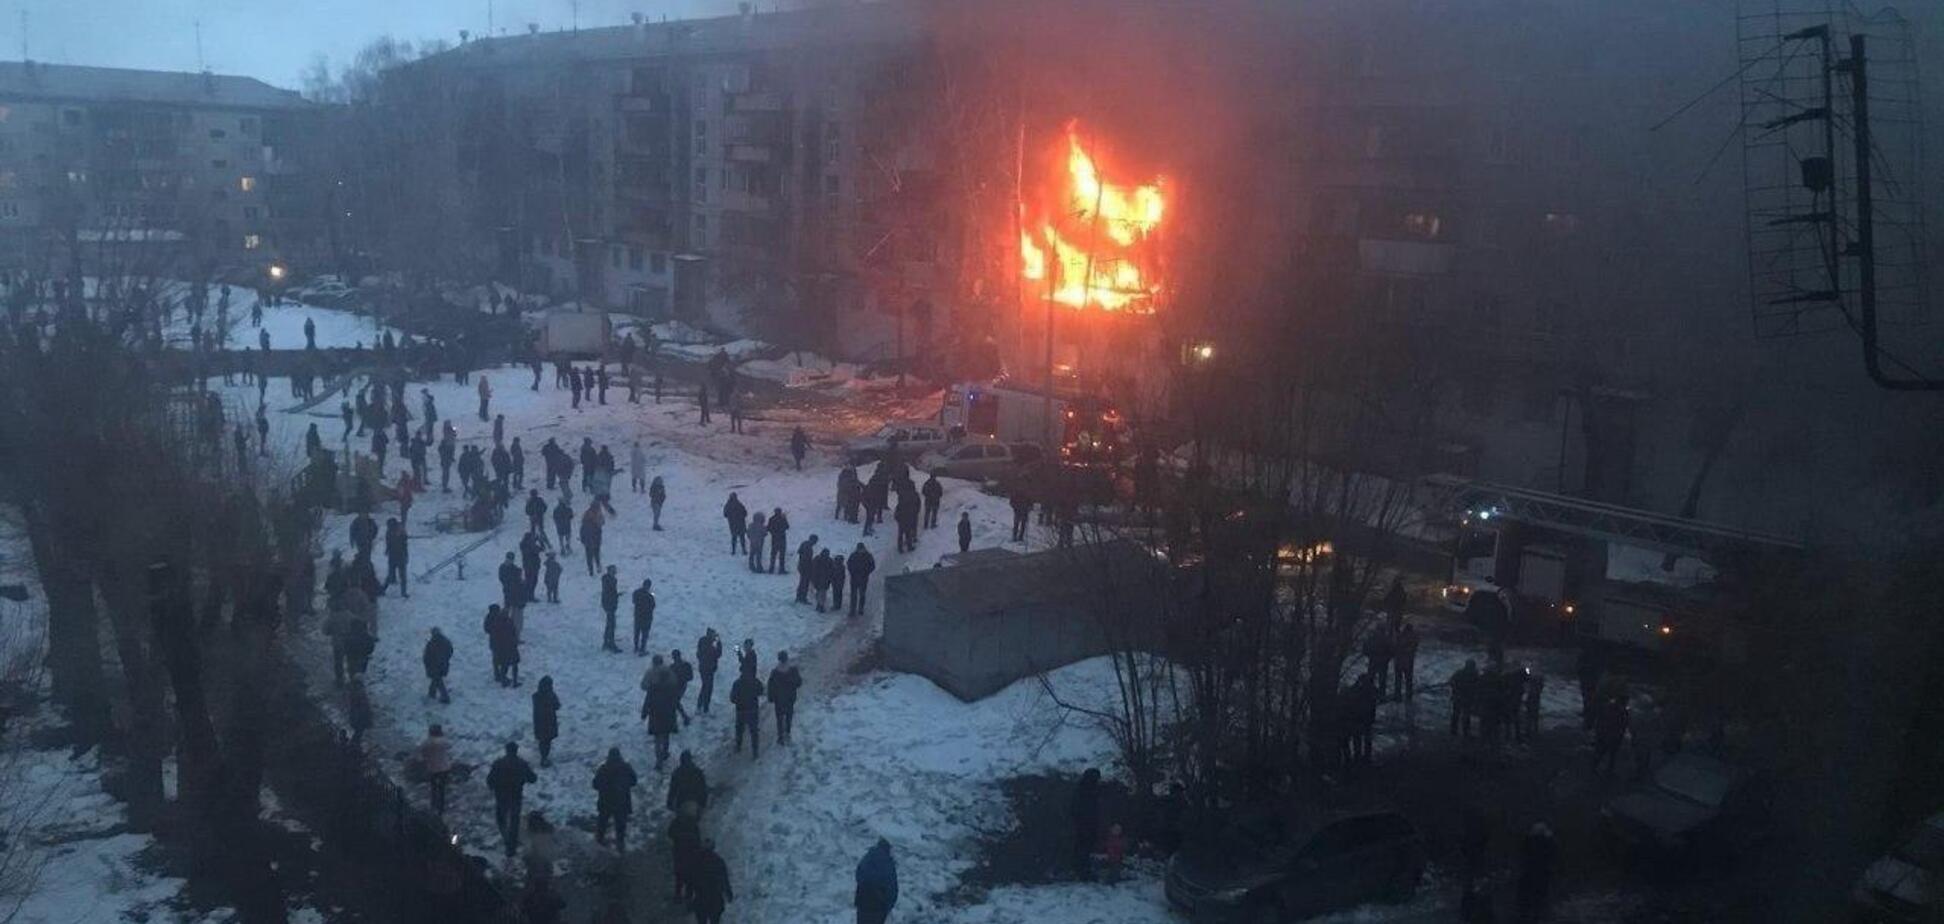 В Магнитогорске взорвалась многоэтажка: погибли два человека. Фото и видео